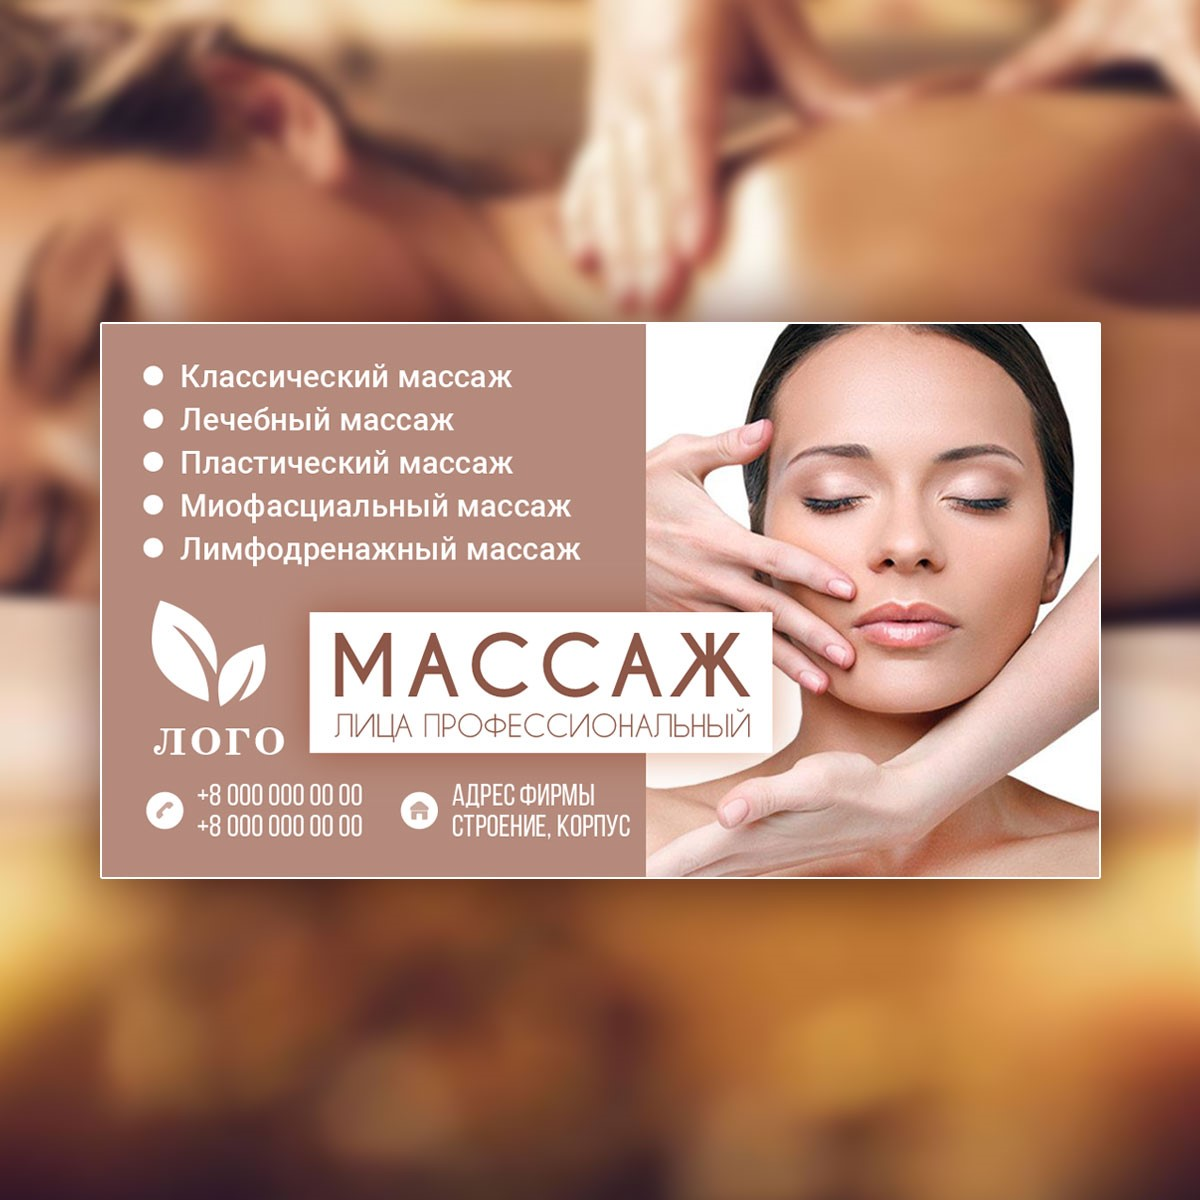 Визитки для массажиста в Москве | фото 6